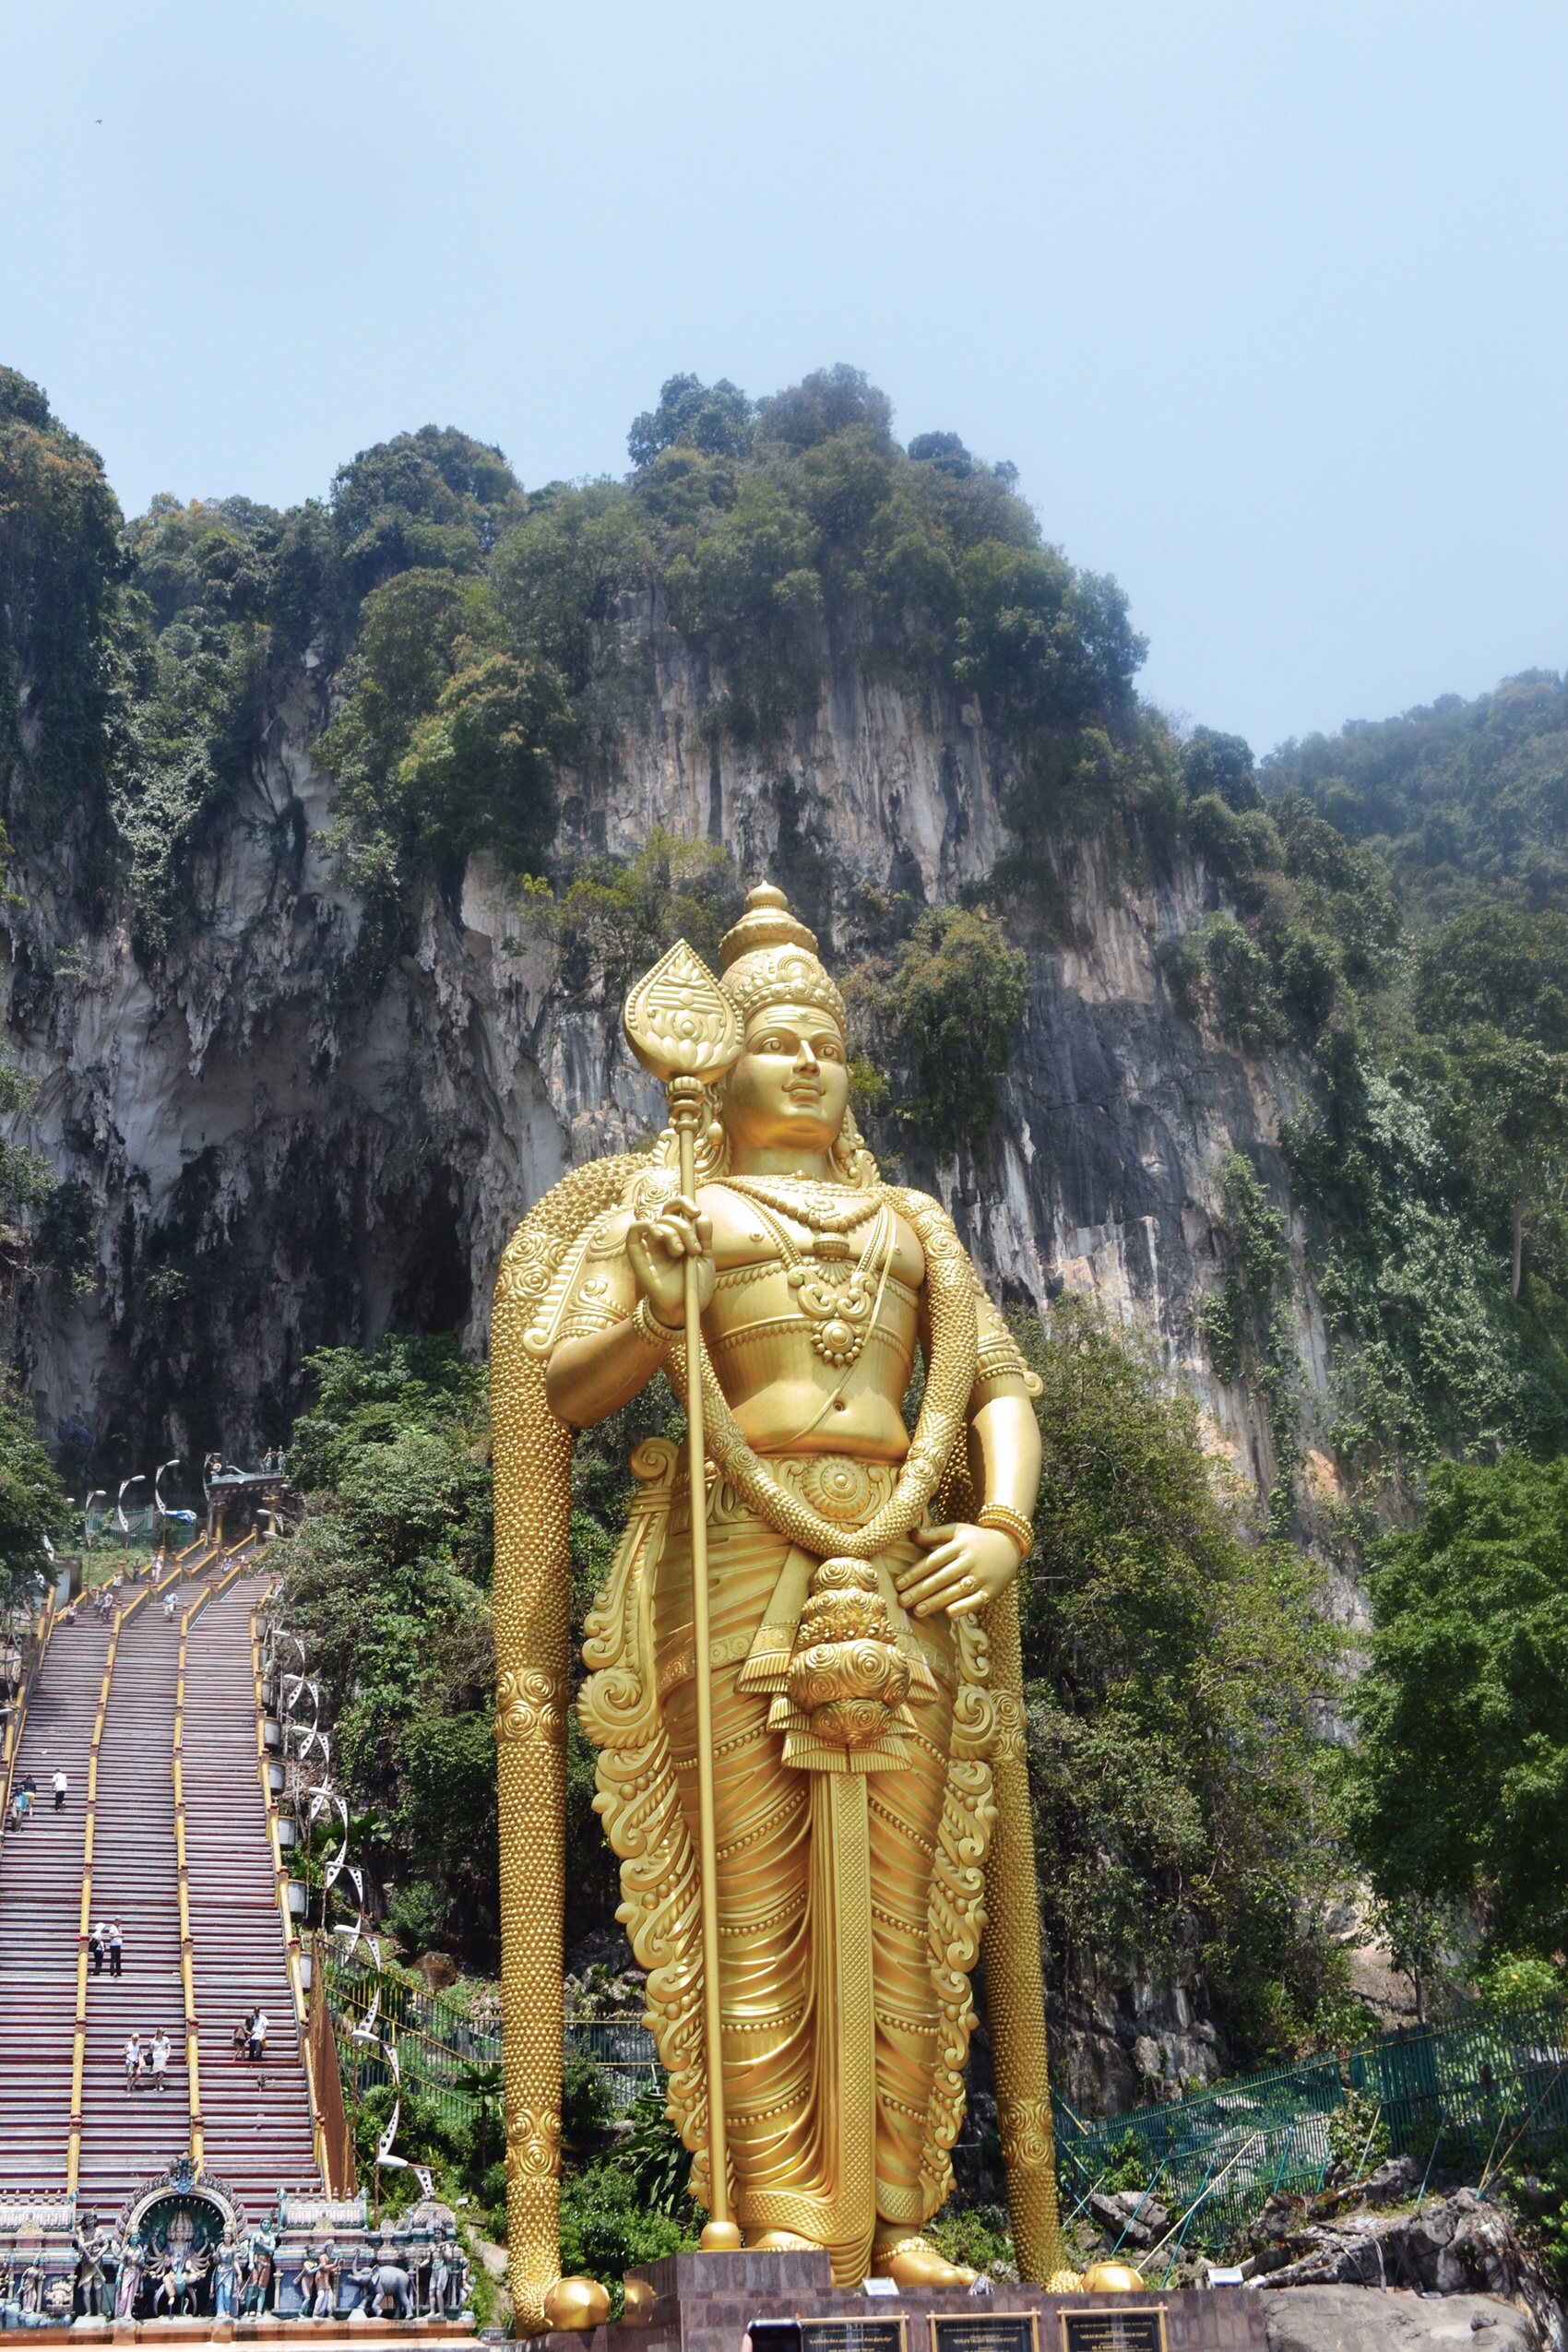 Image of Batu caves in Malaysia